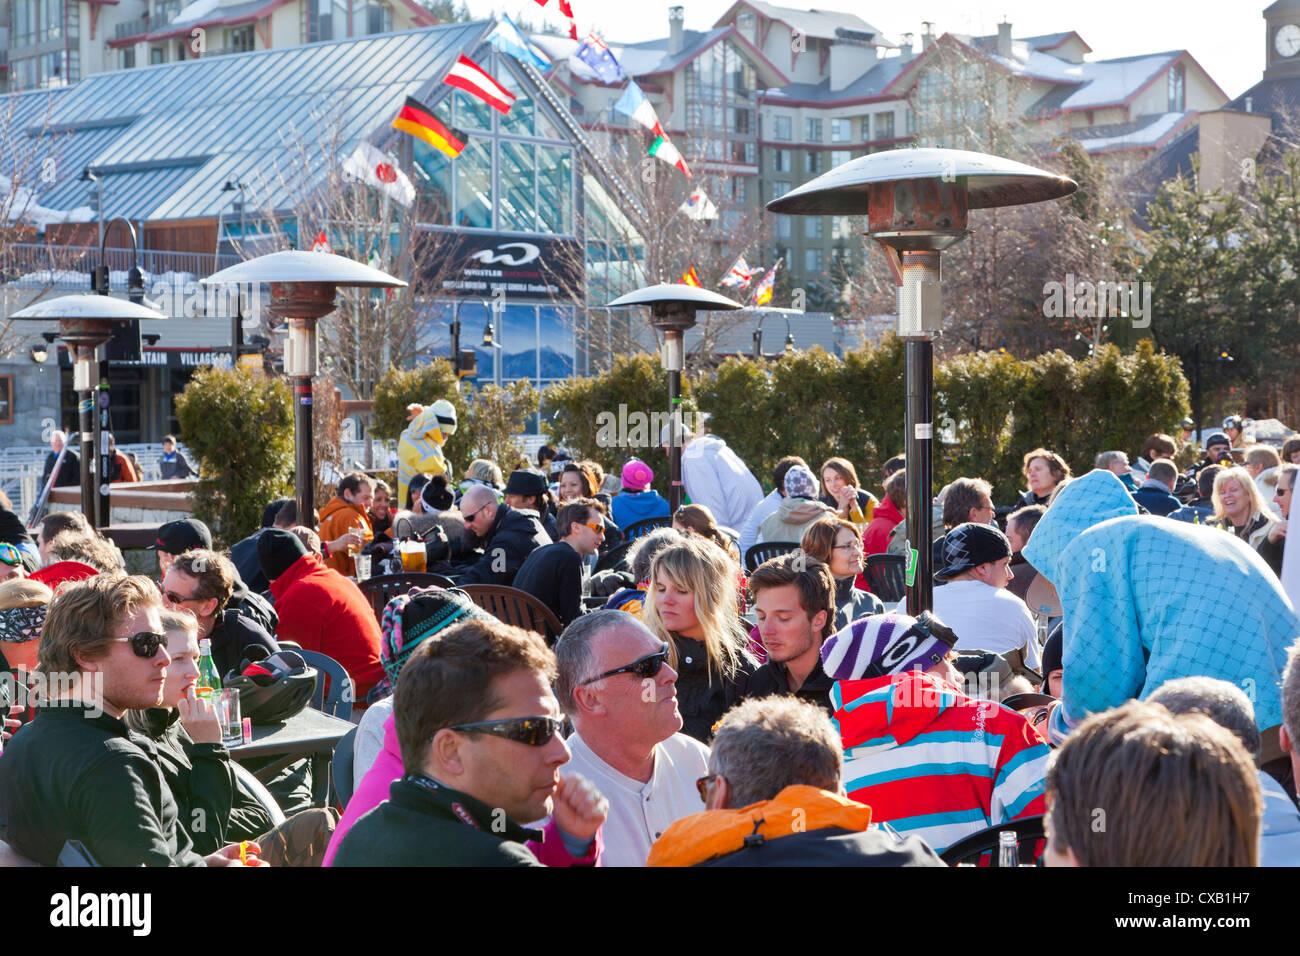 Apres ski, Whistler Village, Whistler Blackcomb Ski Resort, Whistler, British Columbia, Canada, North America Stock Photo